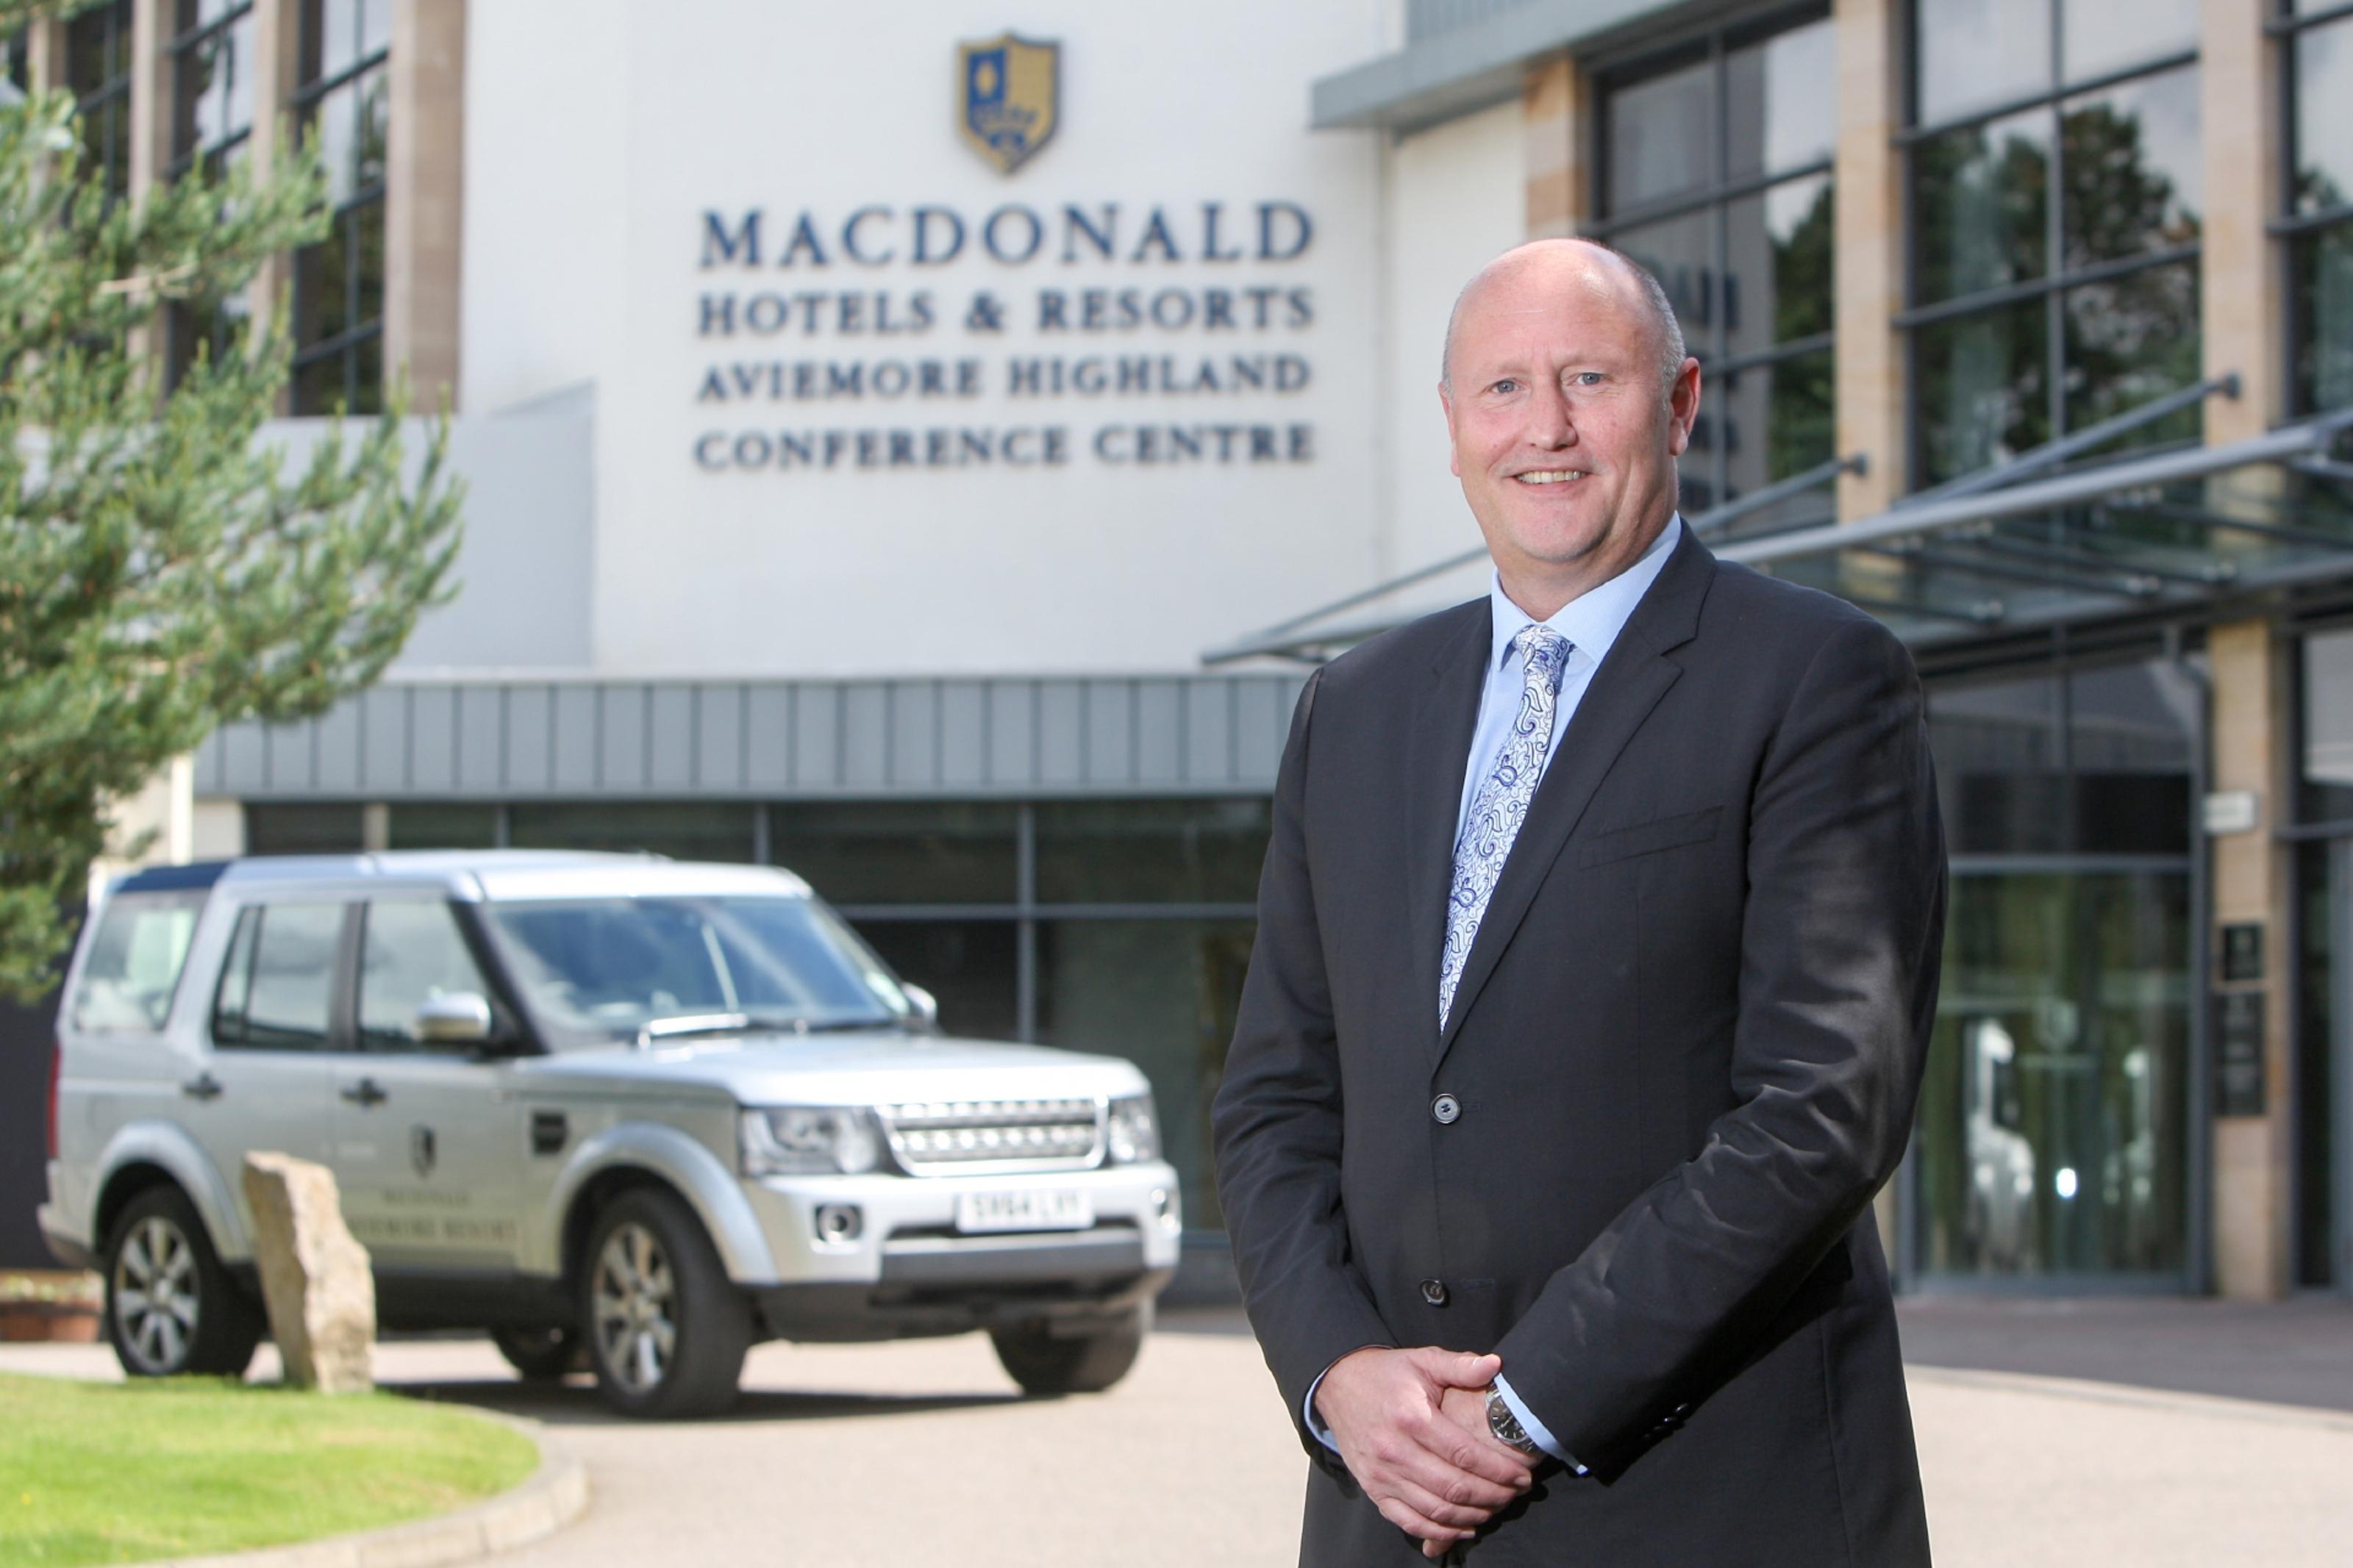 Simon Farr, Macdonald Hotels North of Scotland chief